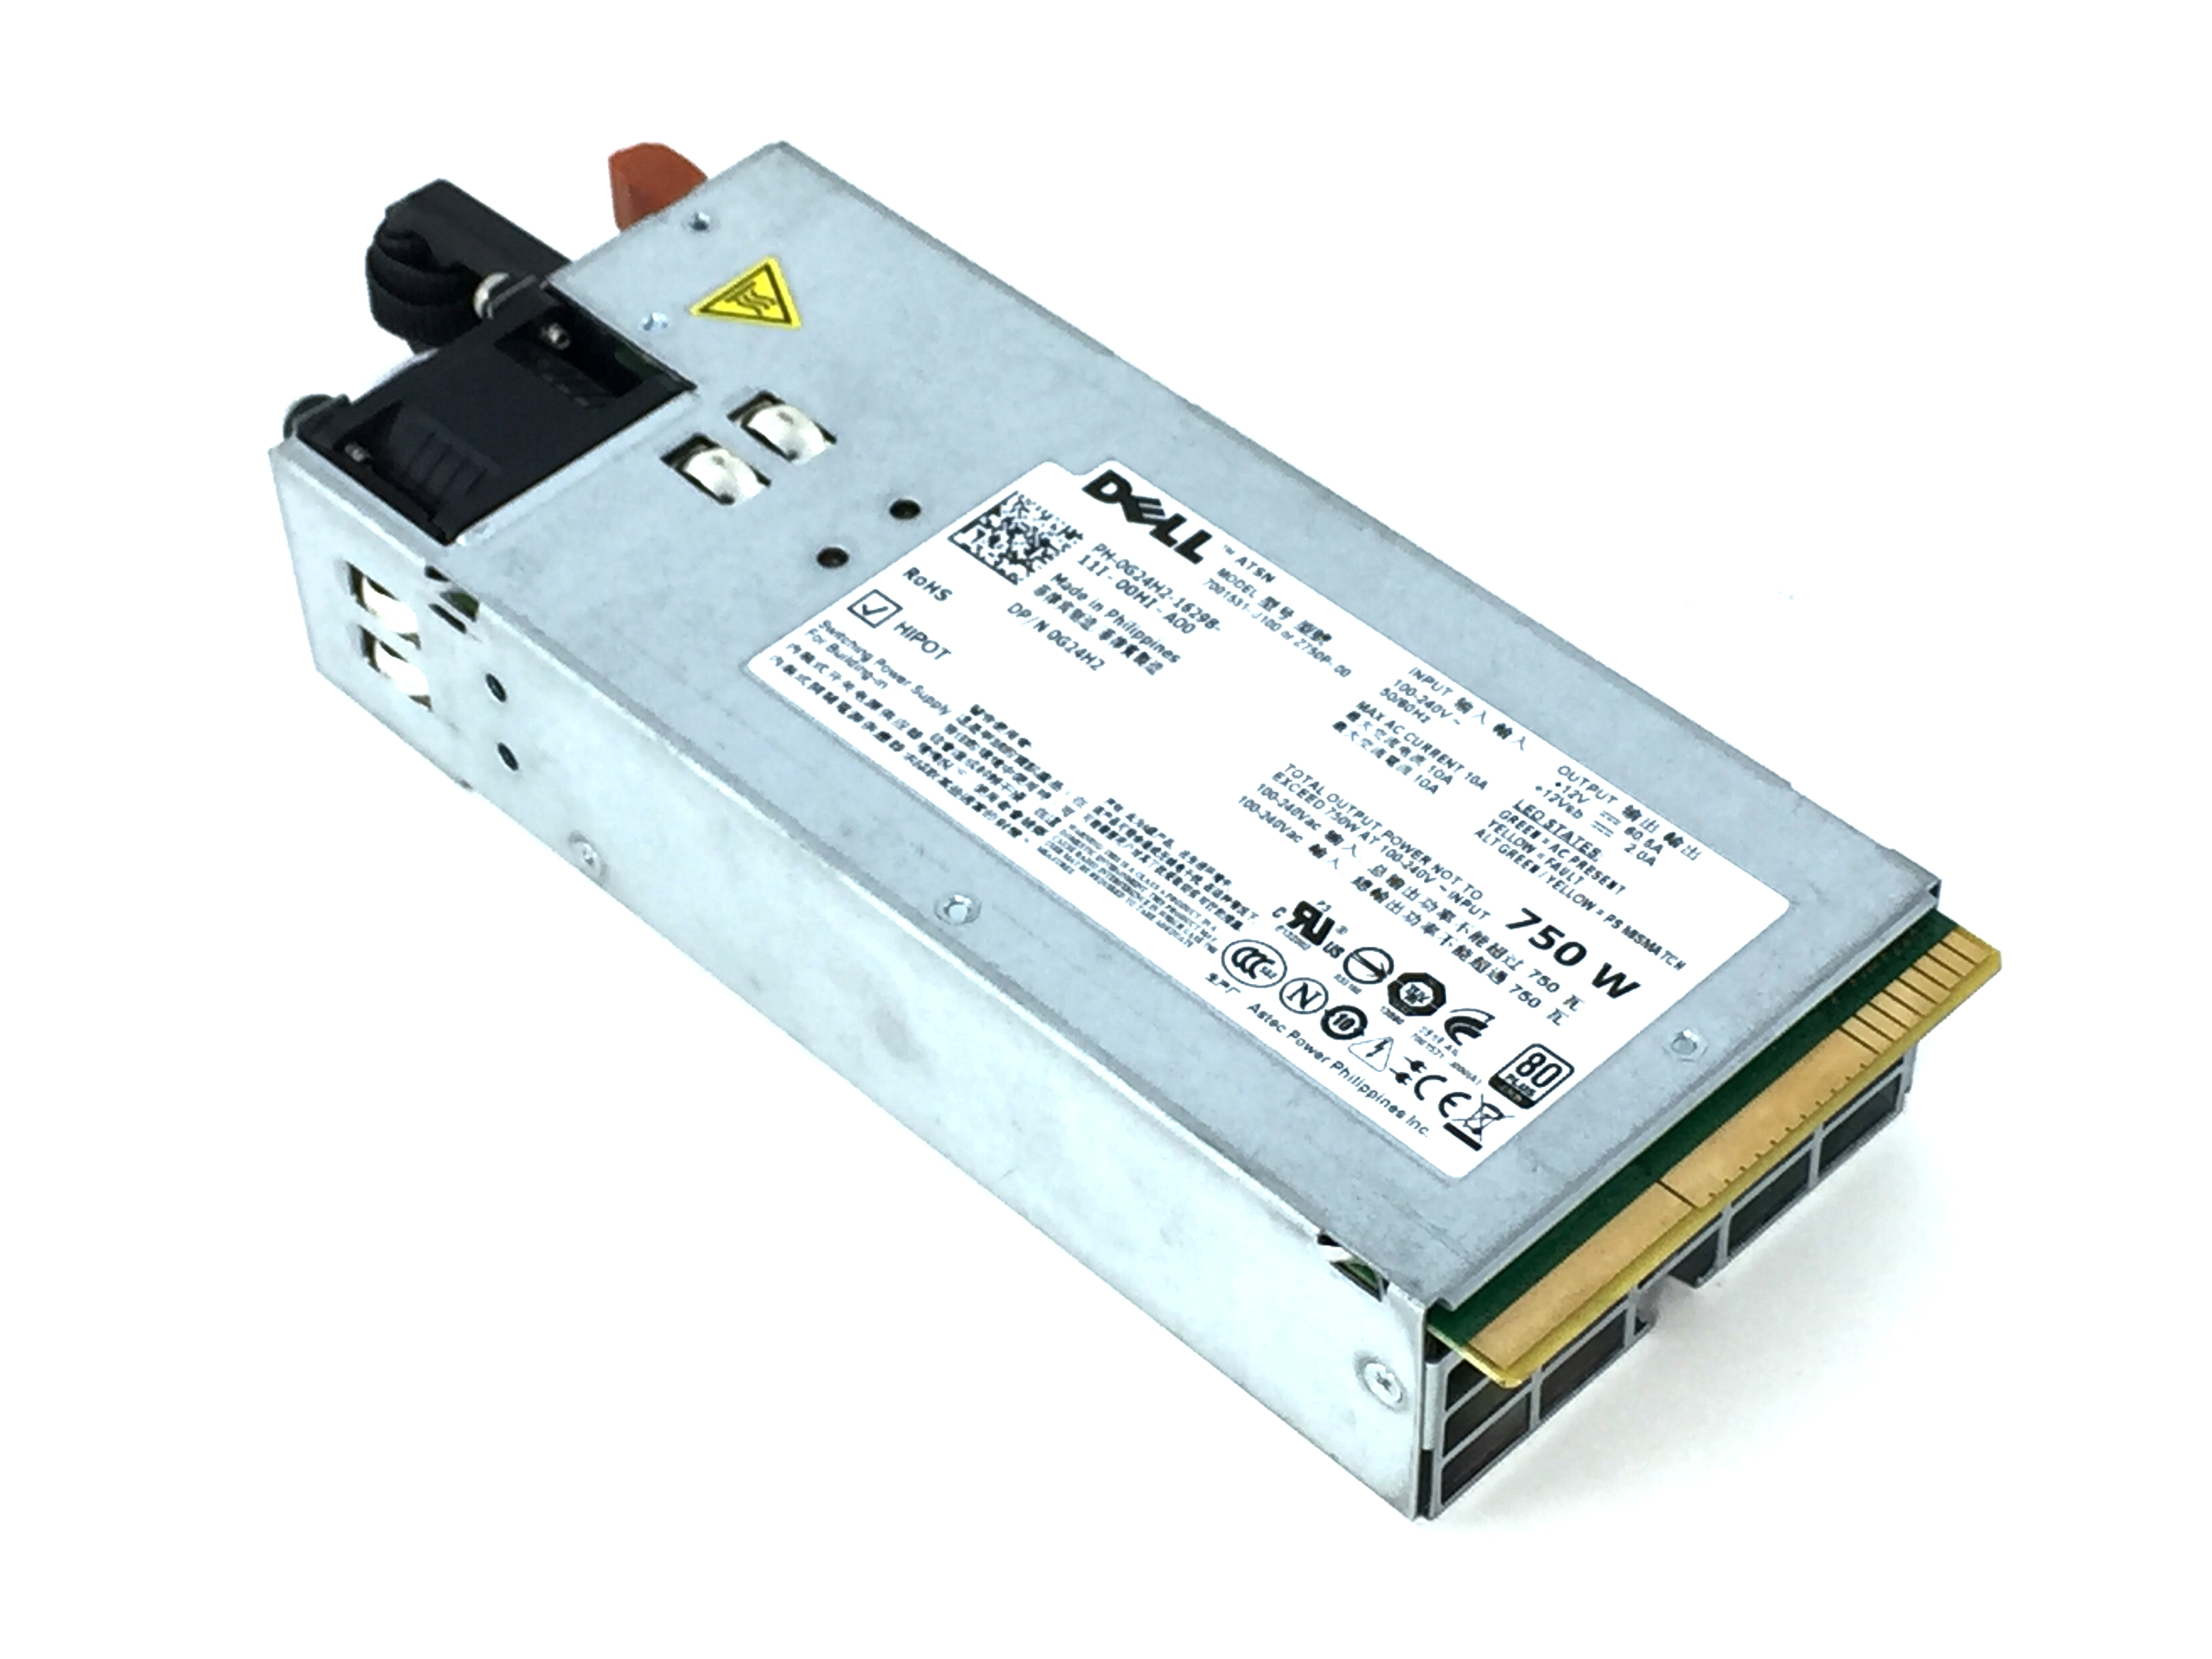 Dell PowerEdge R510 R810 R910 750W Power Supply (G24H2)